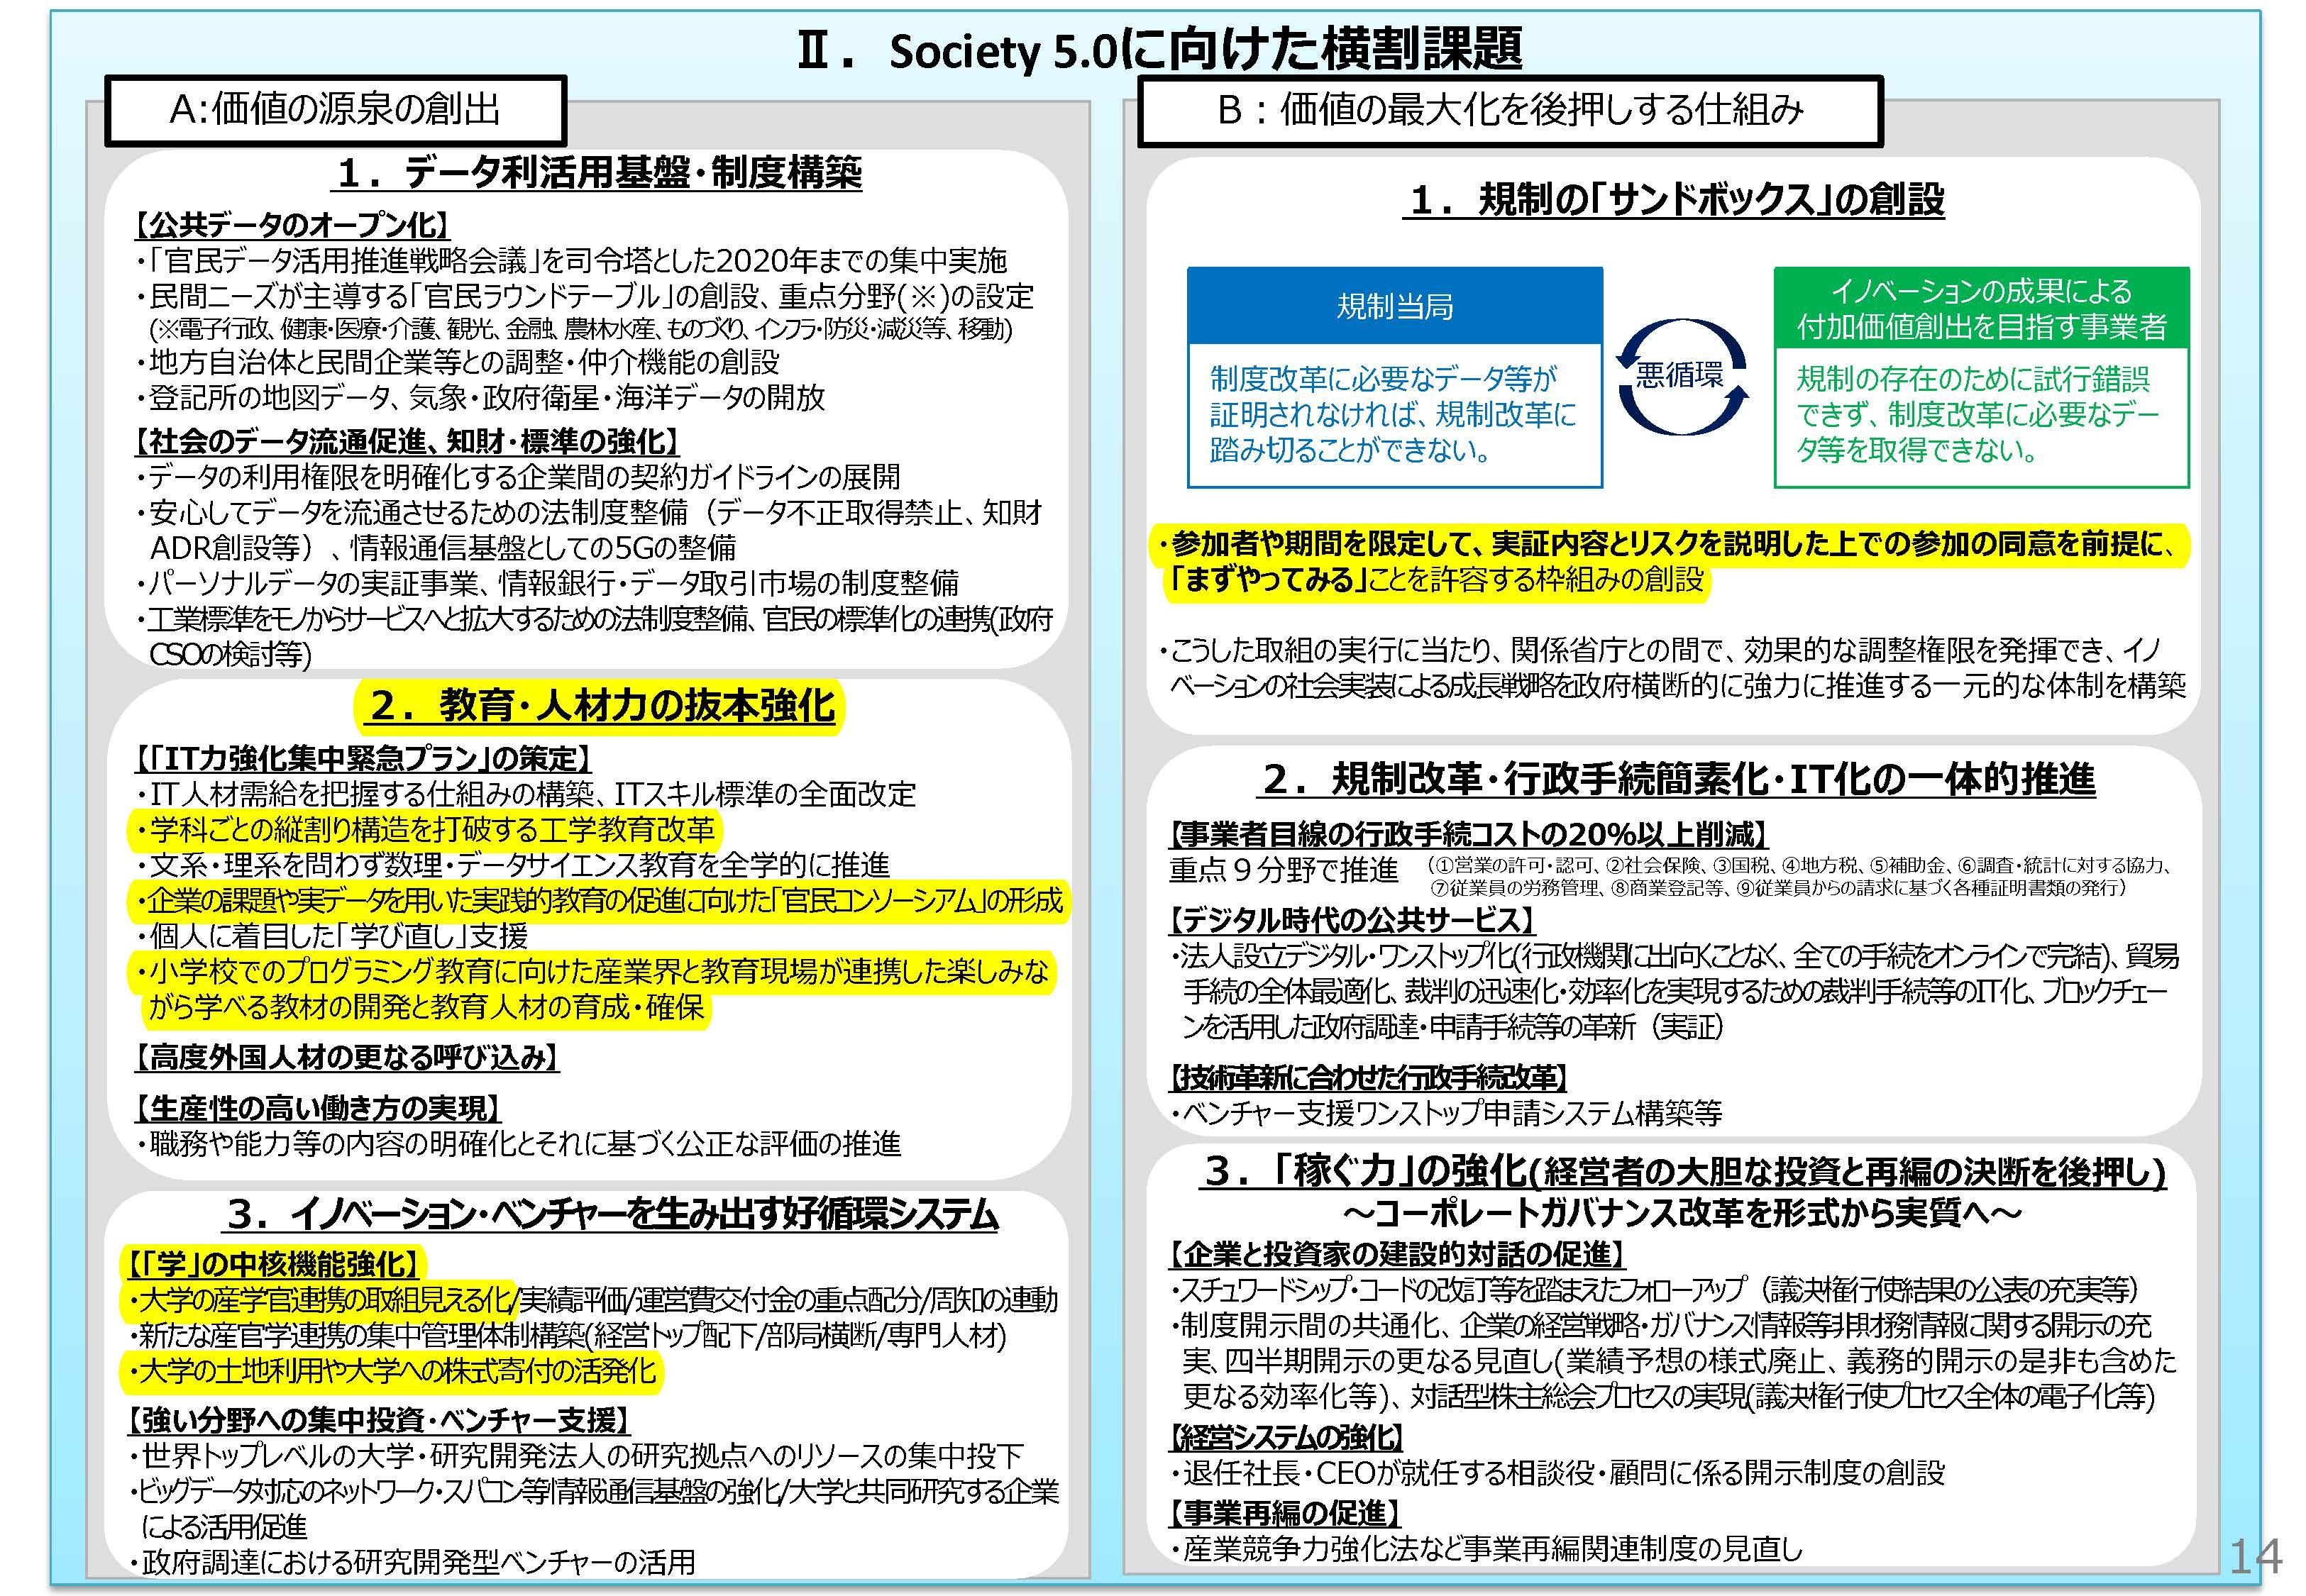 sankou_society5_ページ_15